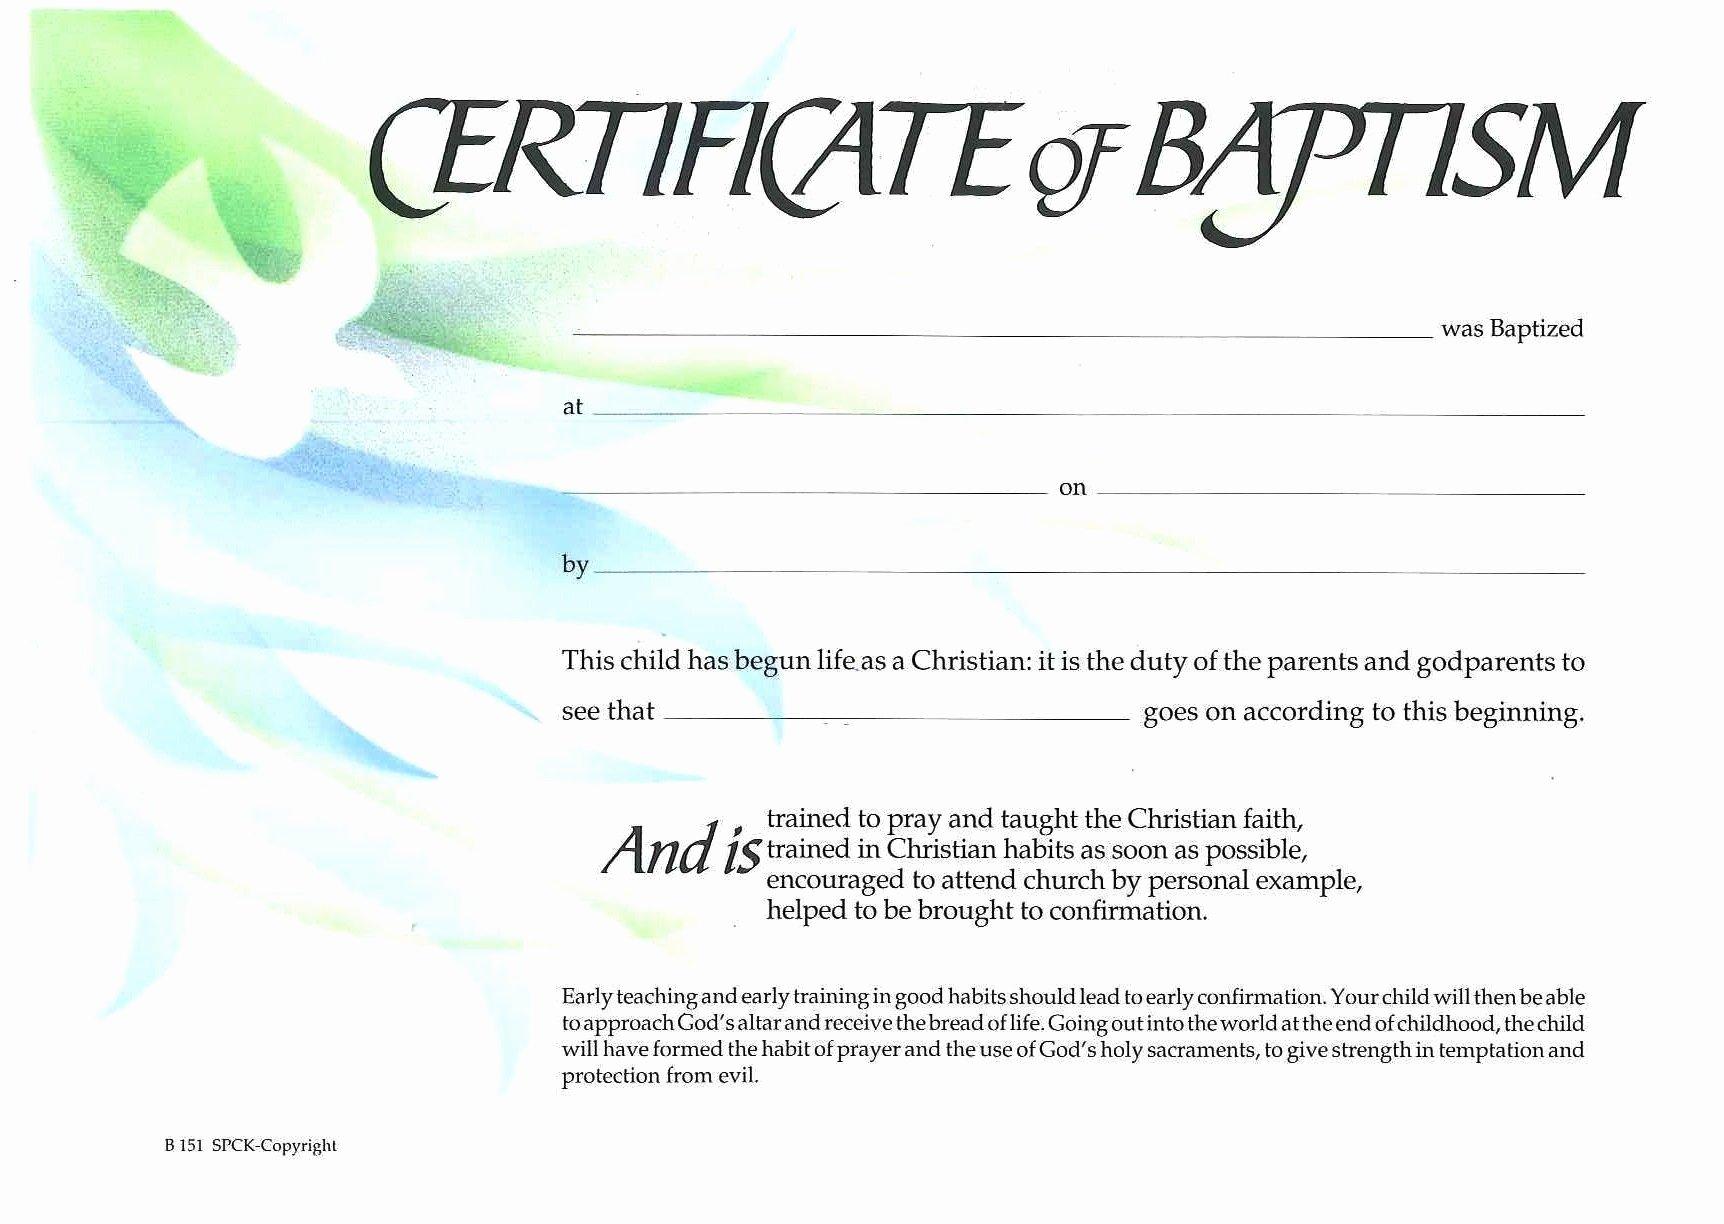 Free Edit Baptism Certificate Template Word Unique Baptism Certificate Xp4eamuz Sunday School